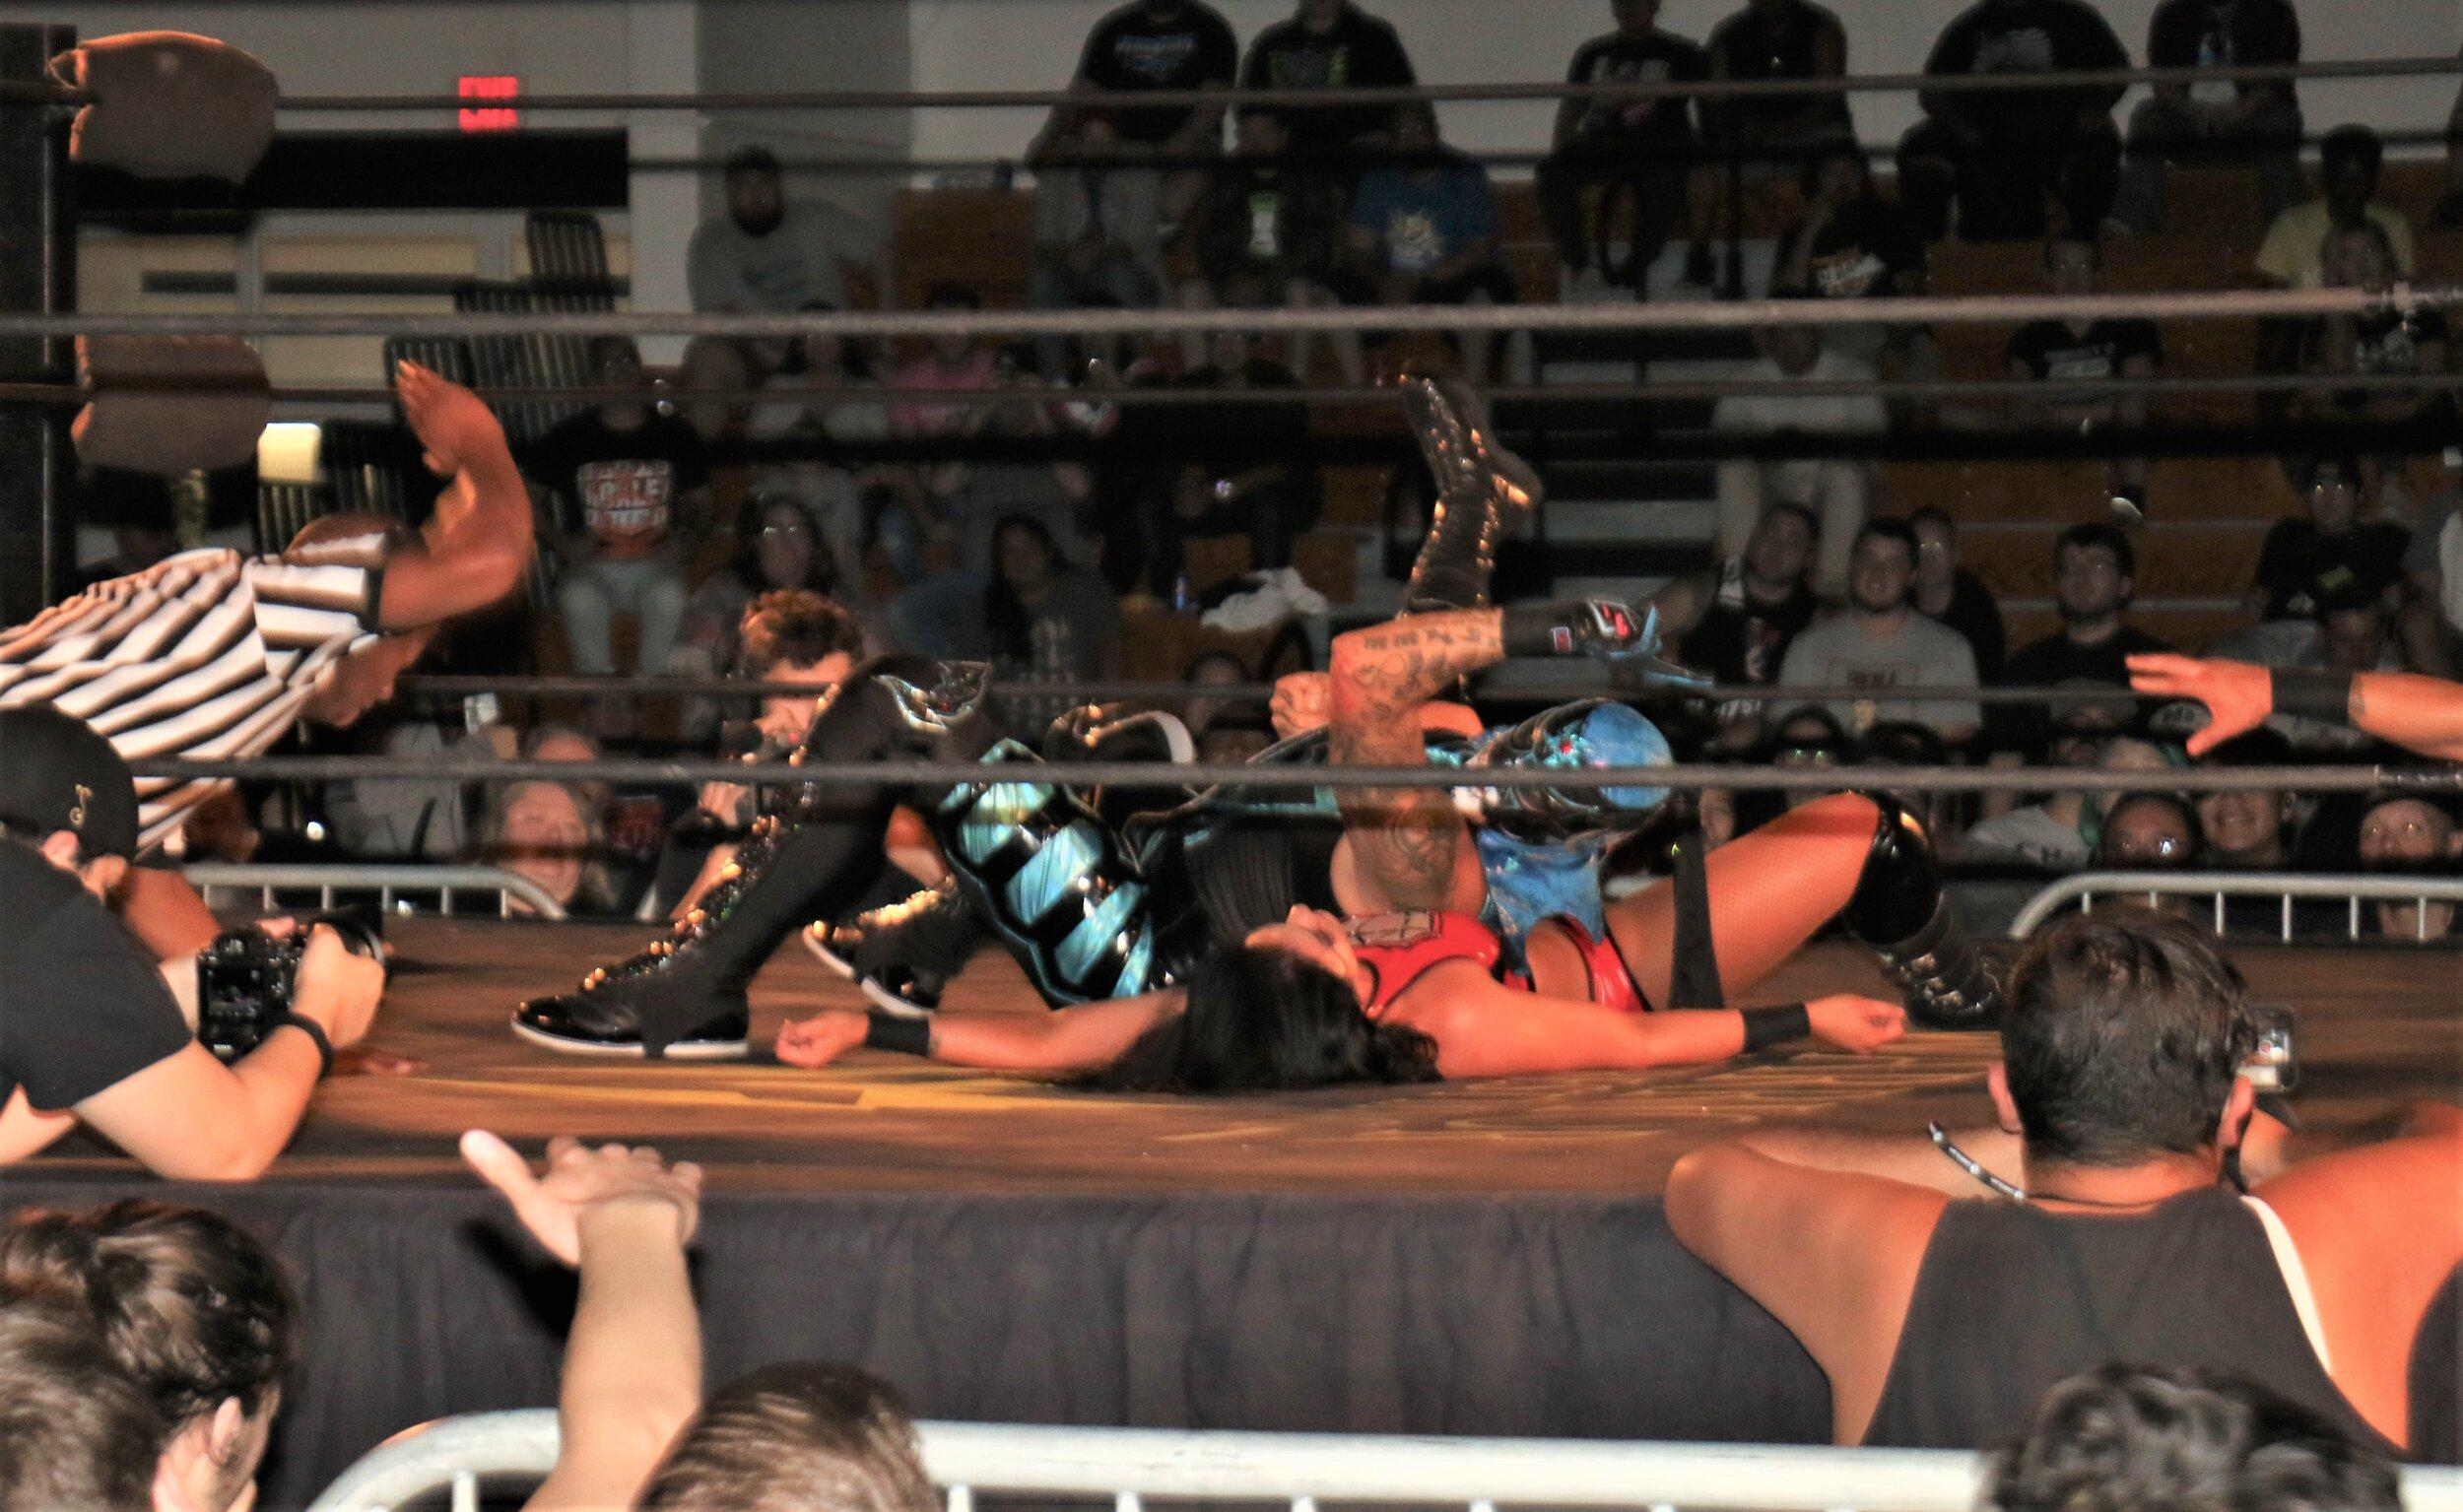 Penta El 0M pins Tessa Blanchard for the tag-team victory.